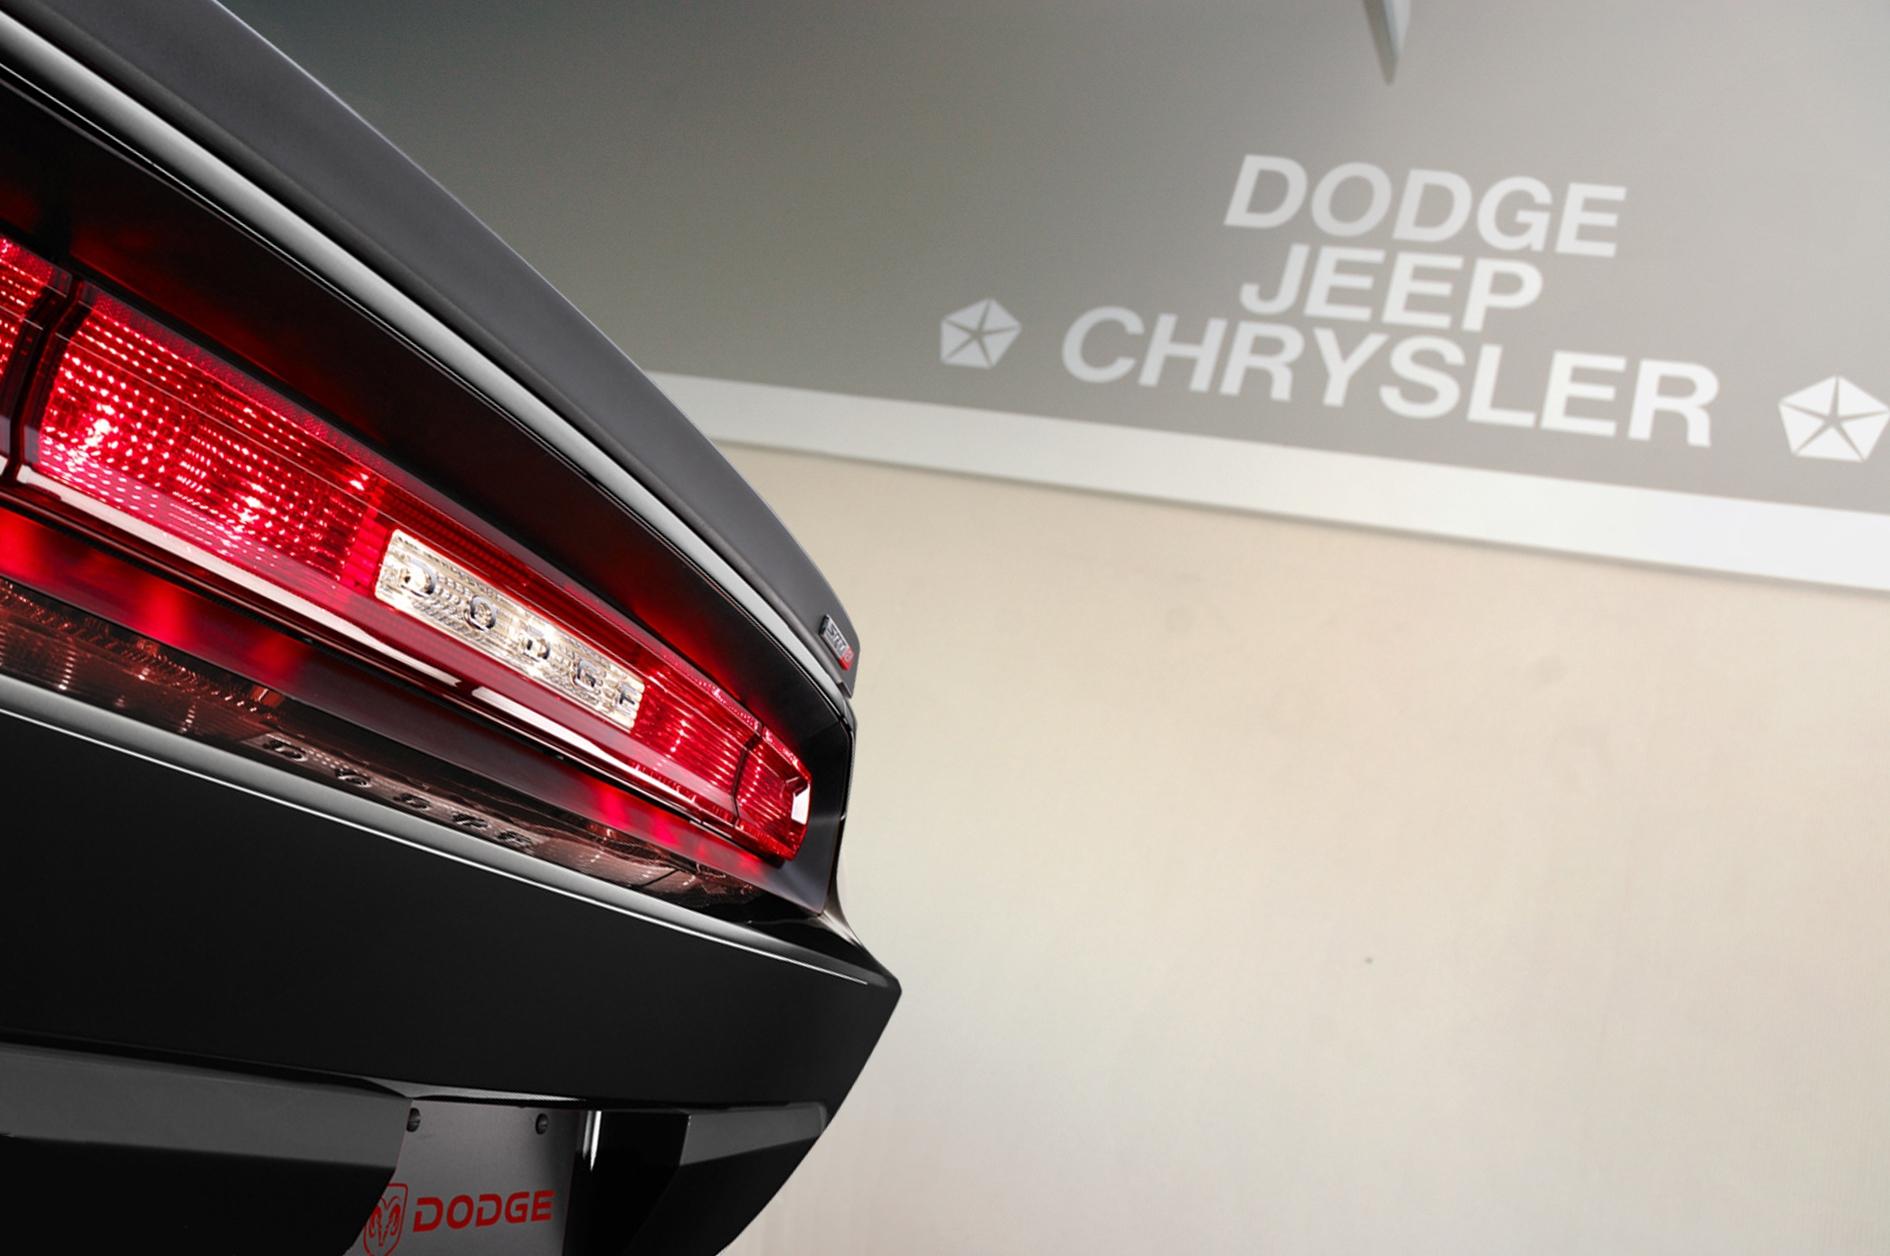 MotorWorld Receives Chrysler 75 Years Award and Dodge Franchise